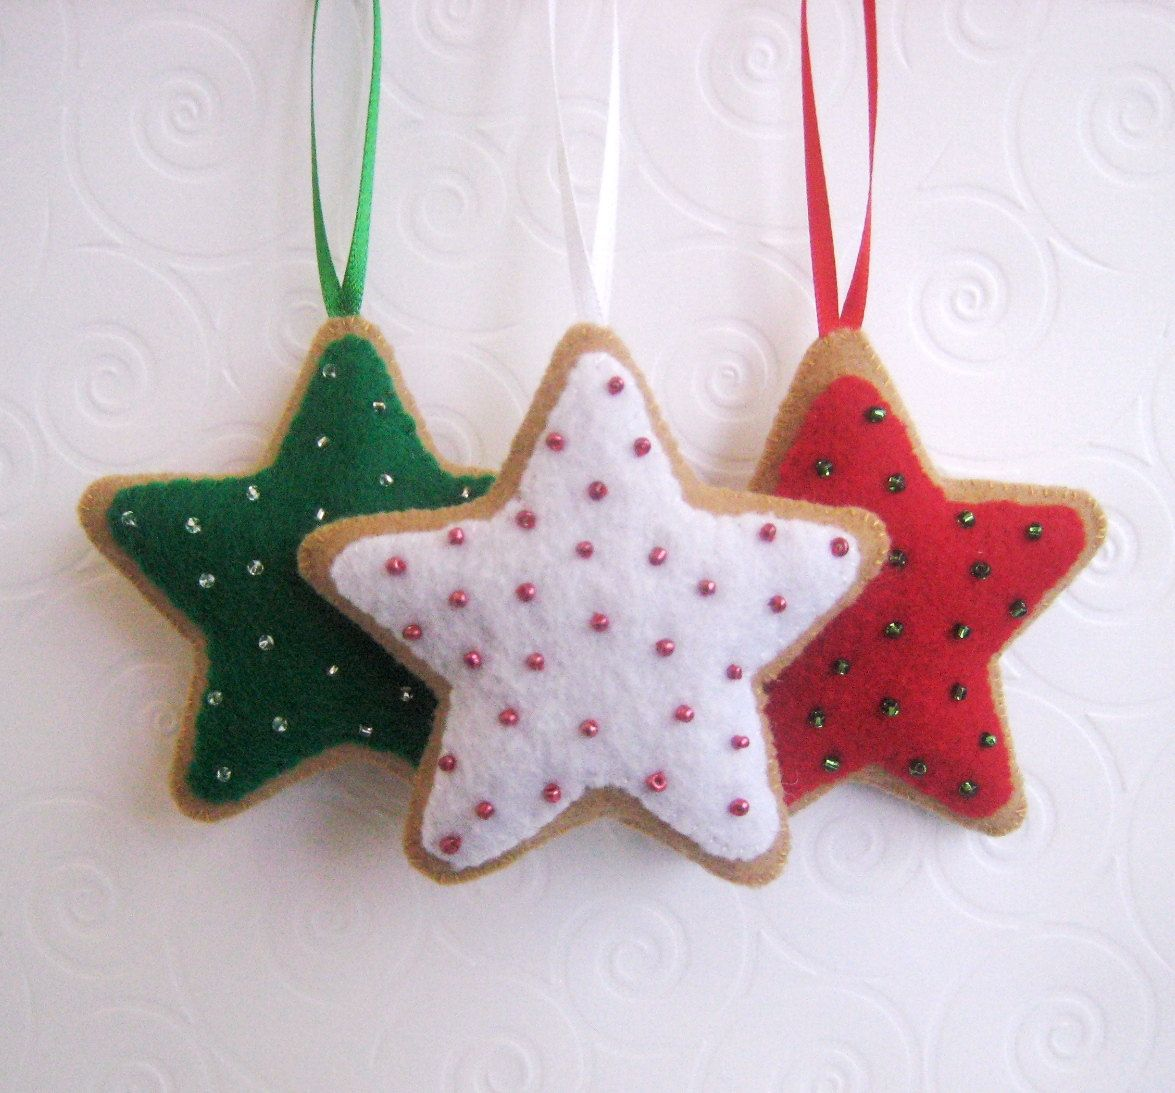 Three Traditional Star Christmas Cookies Felt Ornaments Felt Christmas Decorations Felt Christmas Ornaments Felt Crafts Christmas